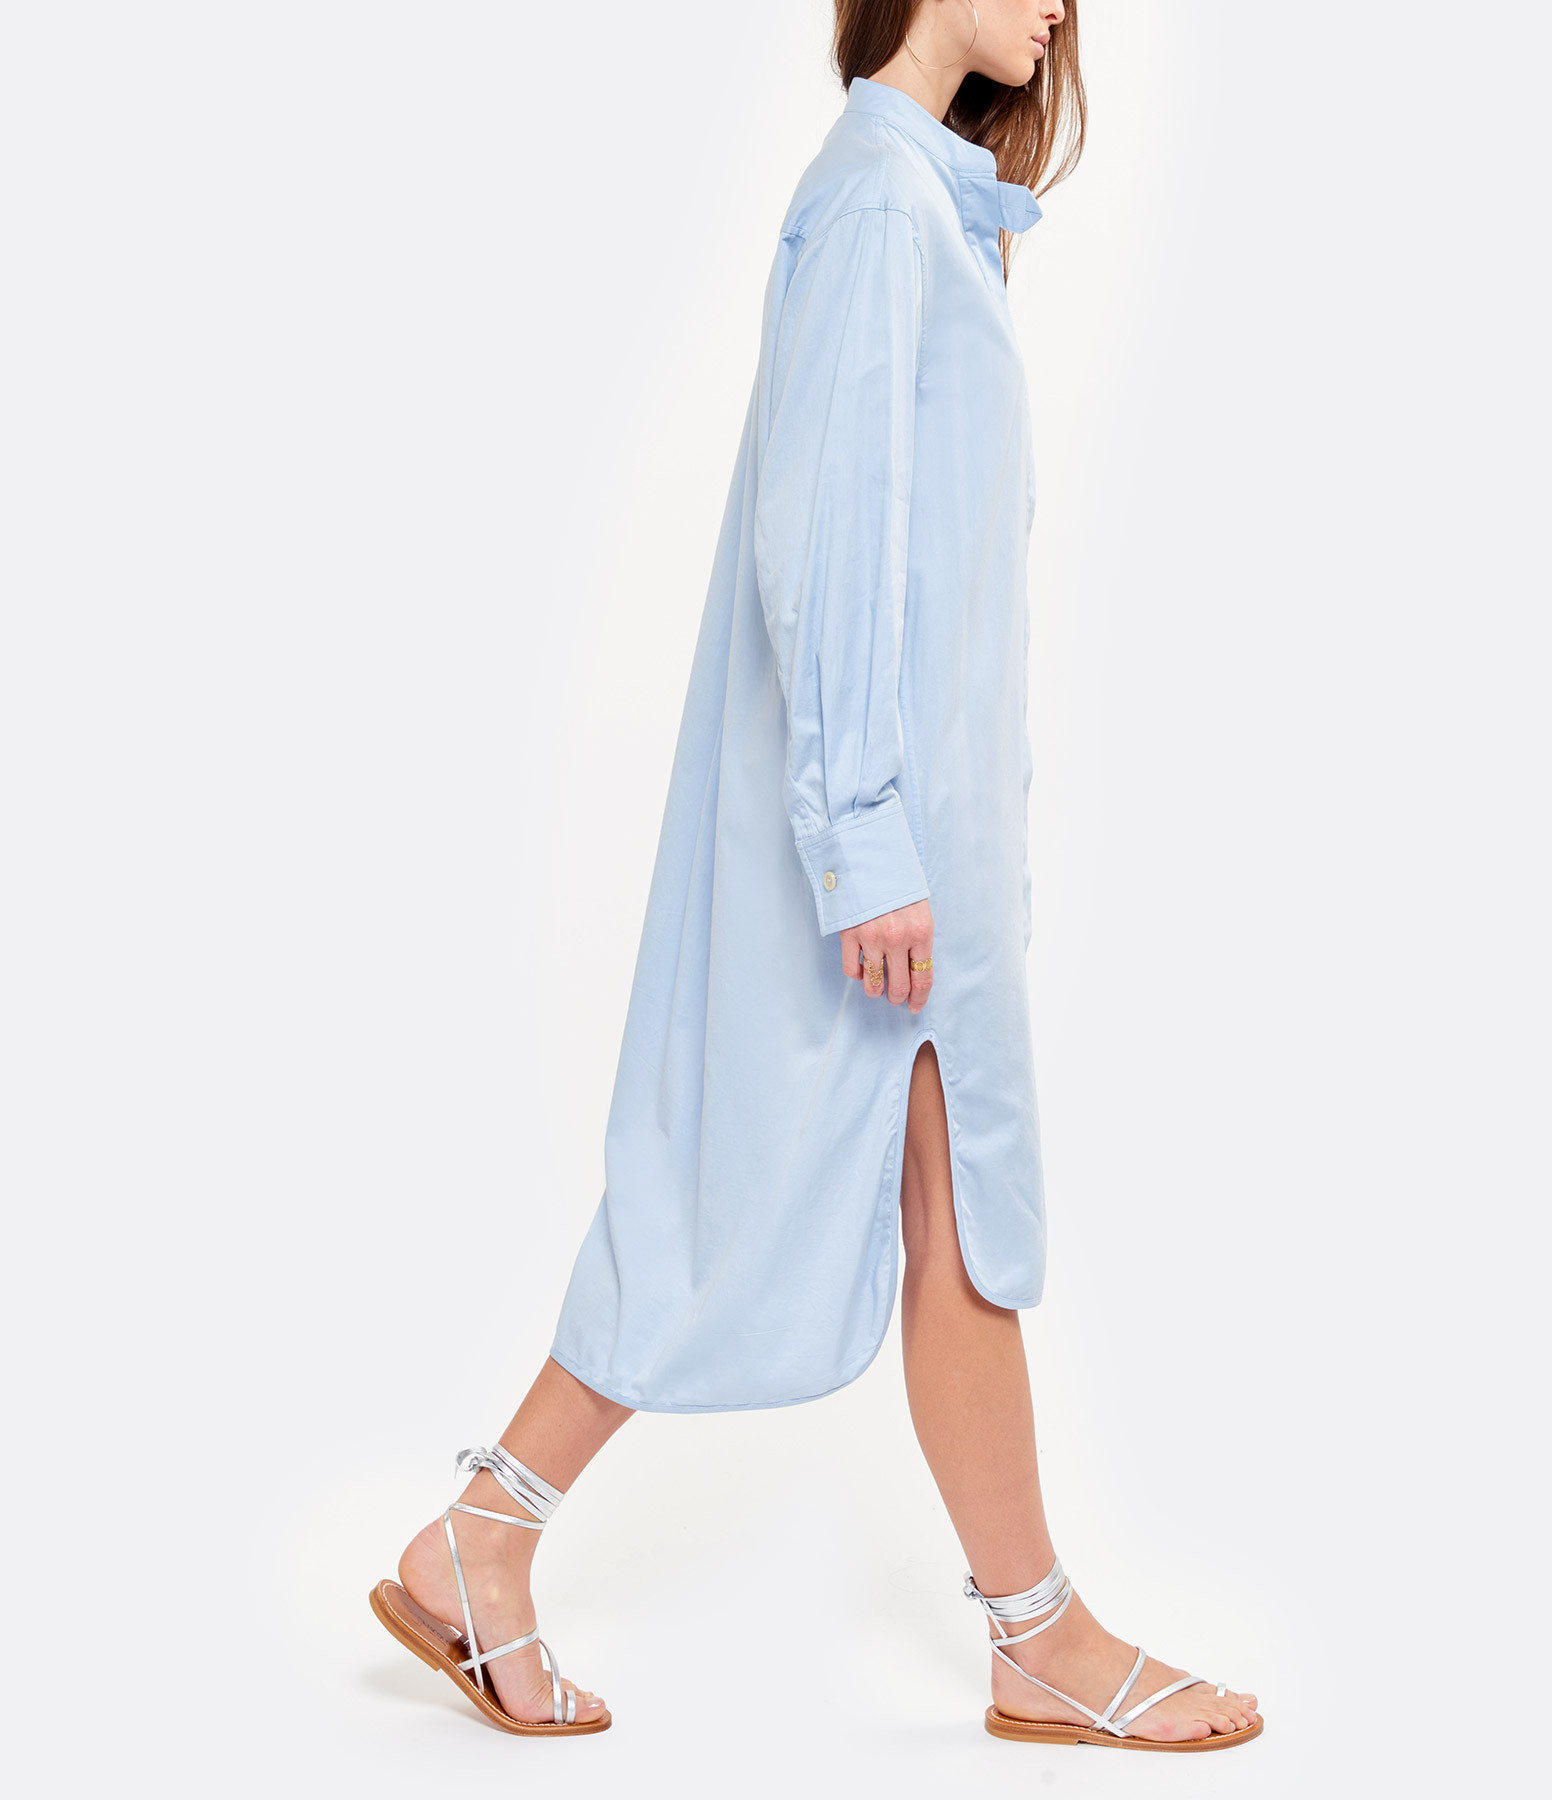 LAURENCE BRAS - Robe Picasso Coton Bleu